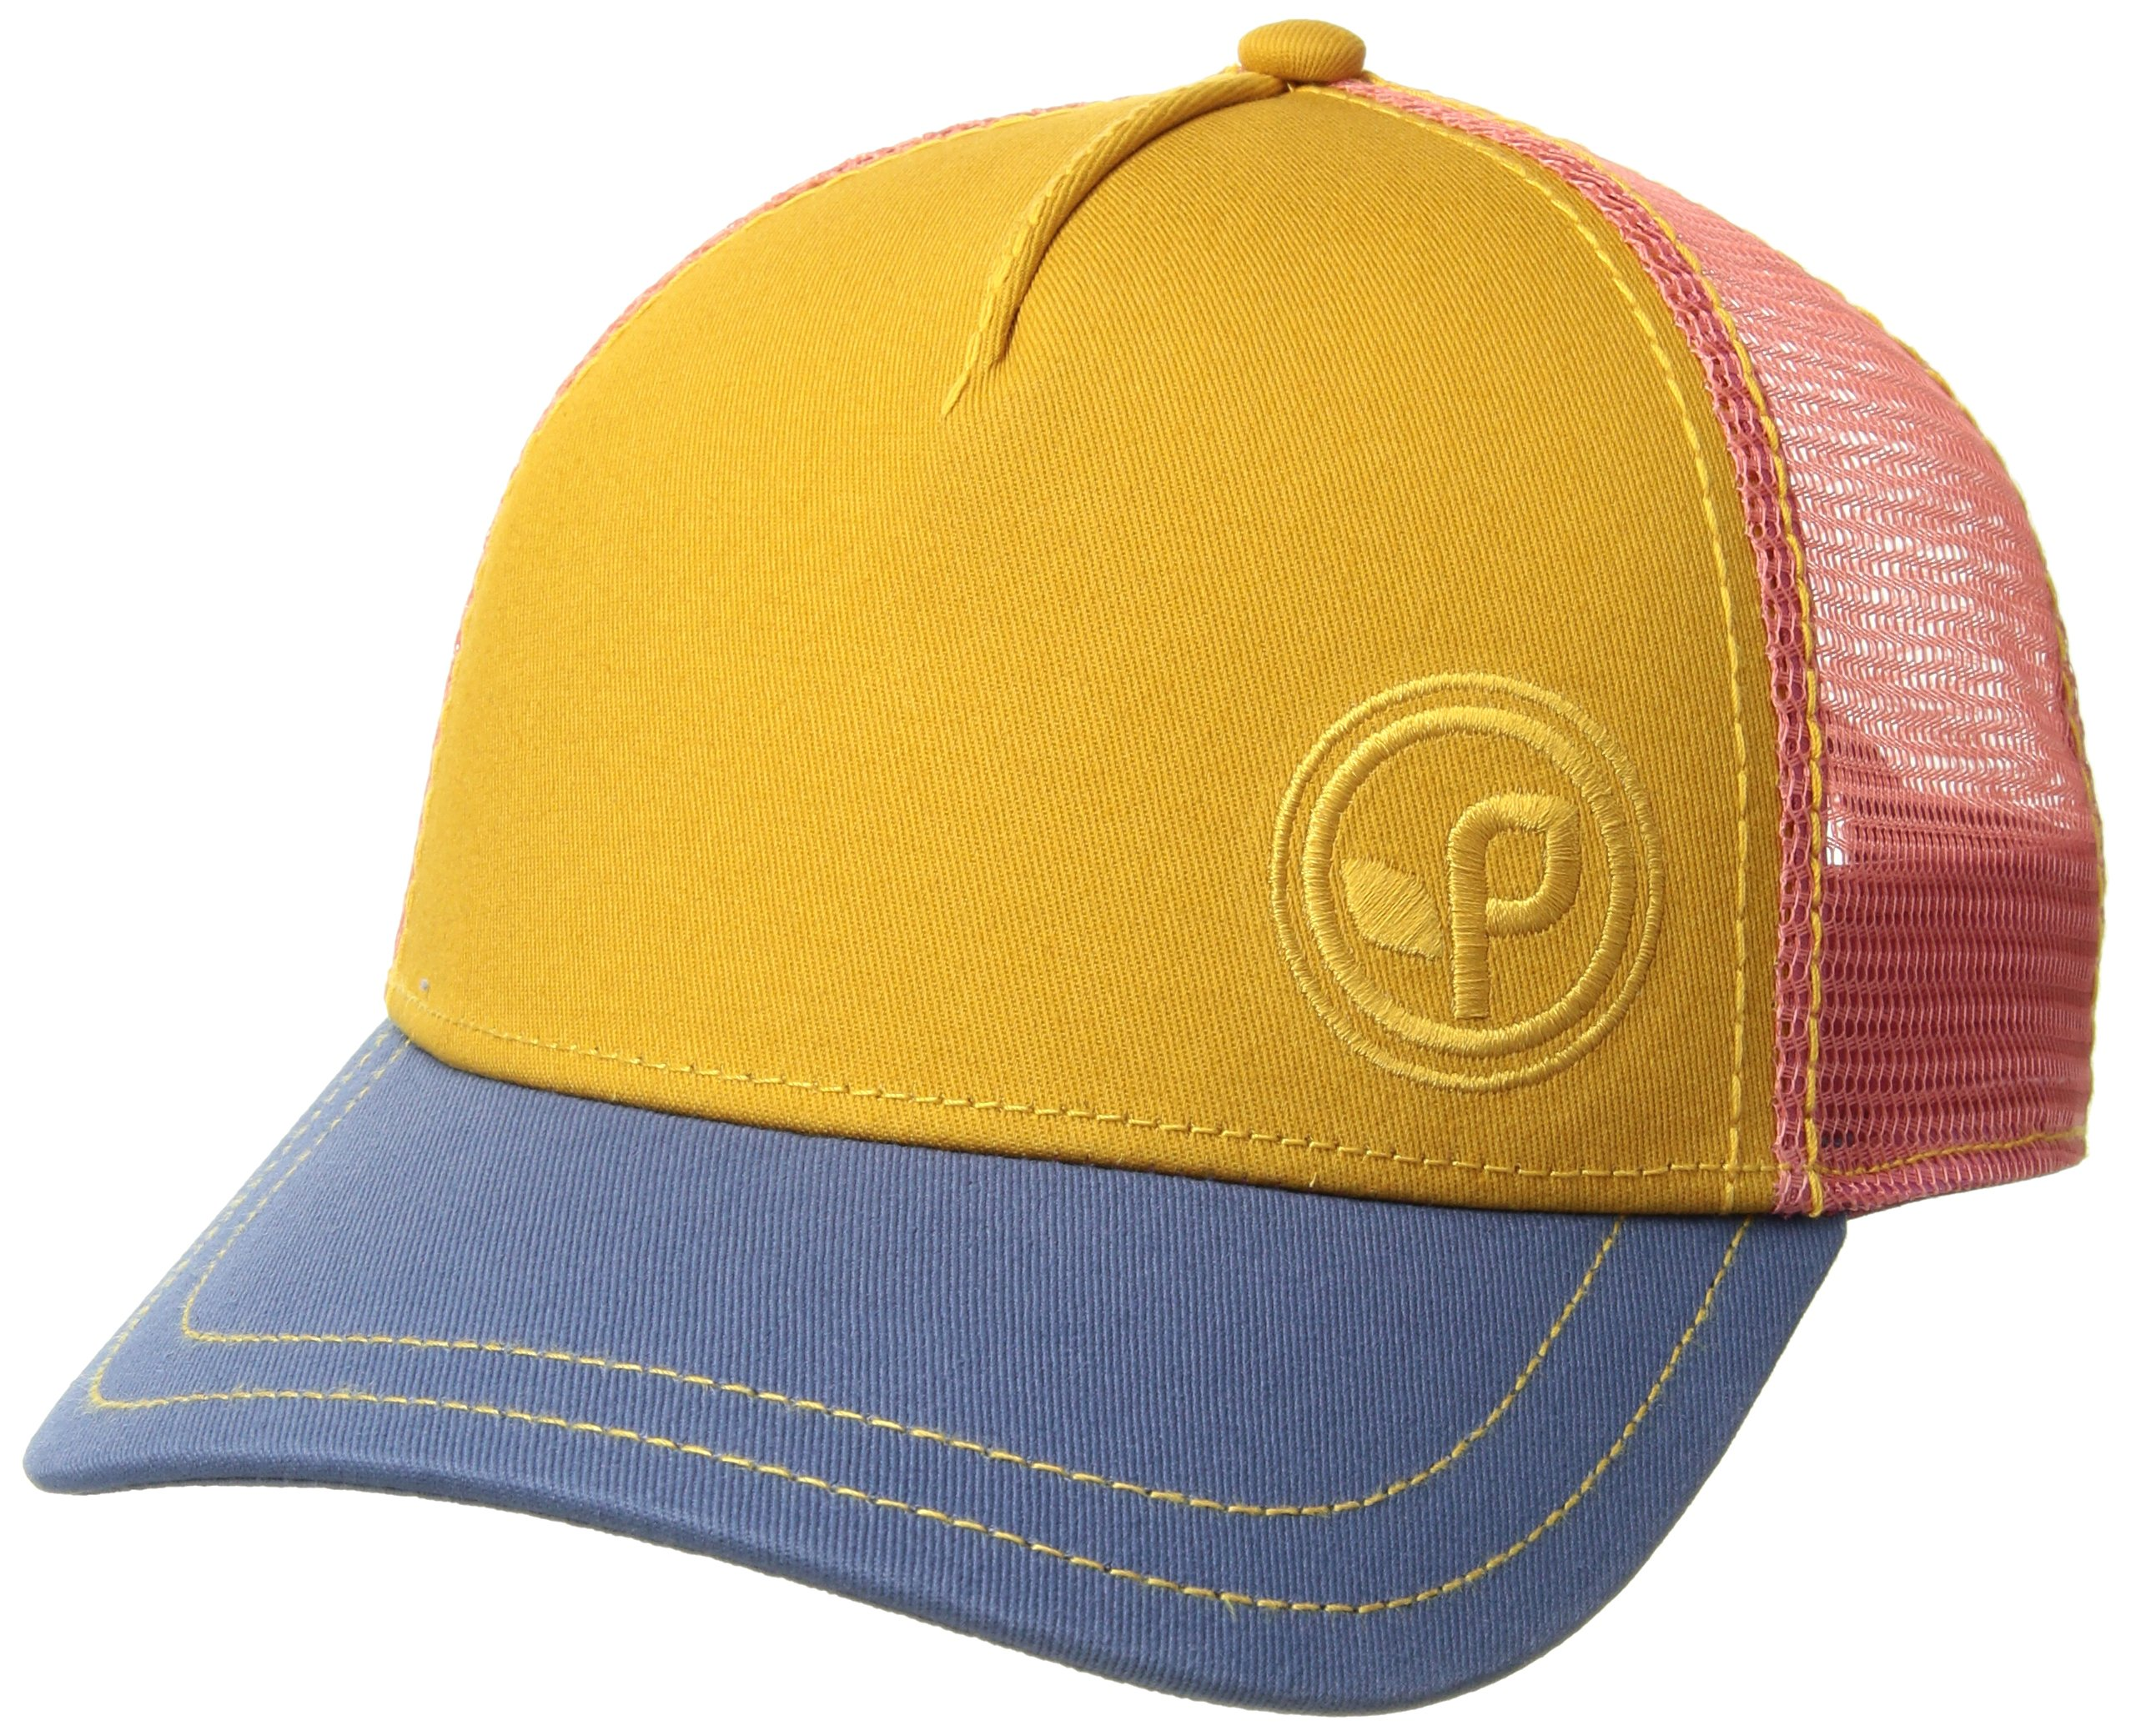 pistil Buttercup Cap, Yam, One Size by pistil